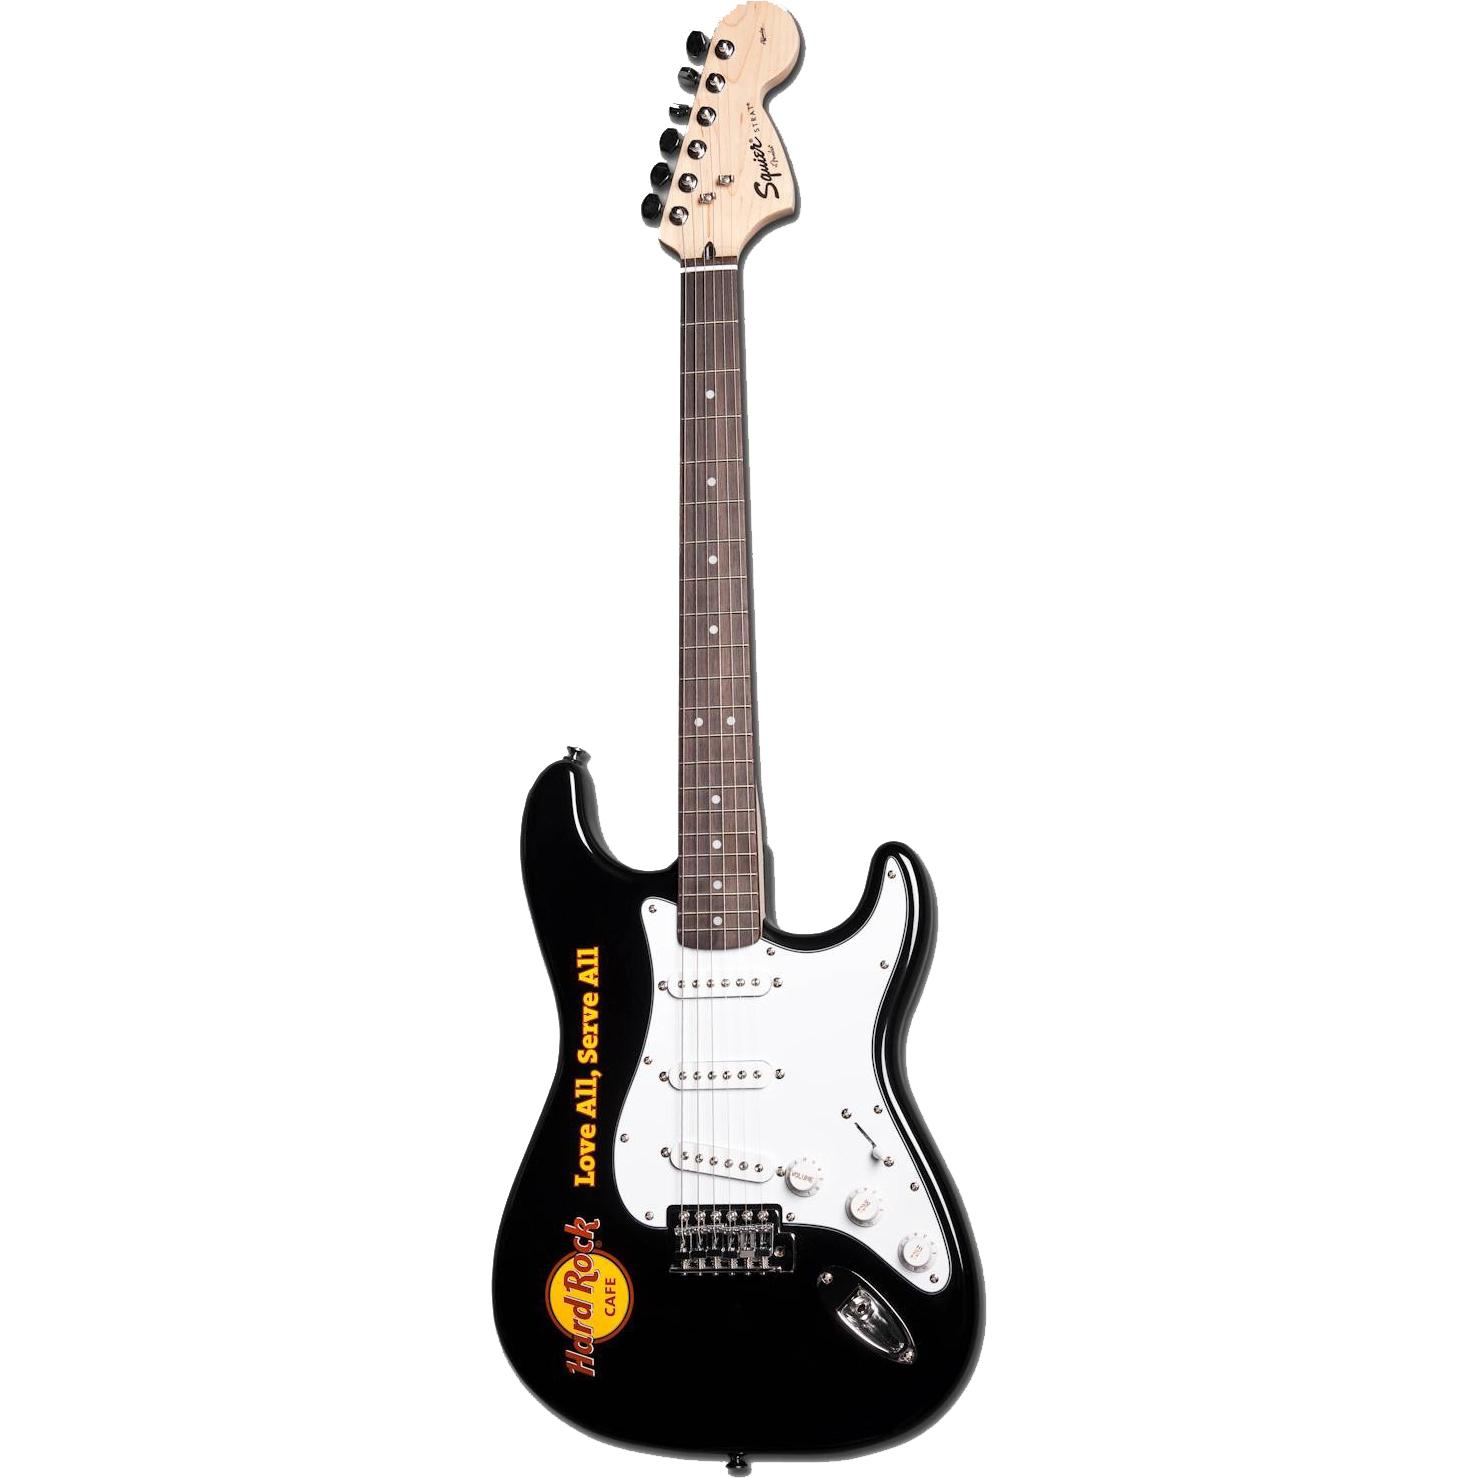 Fender Squier Stratocaster 0